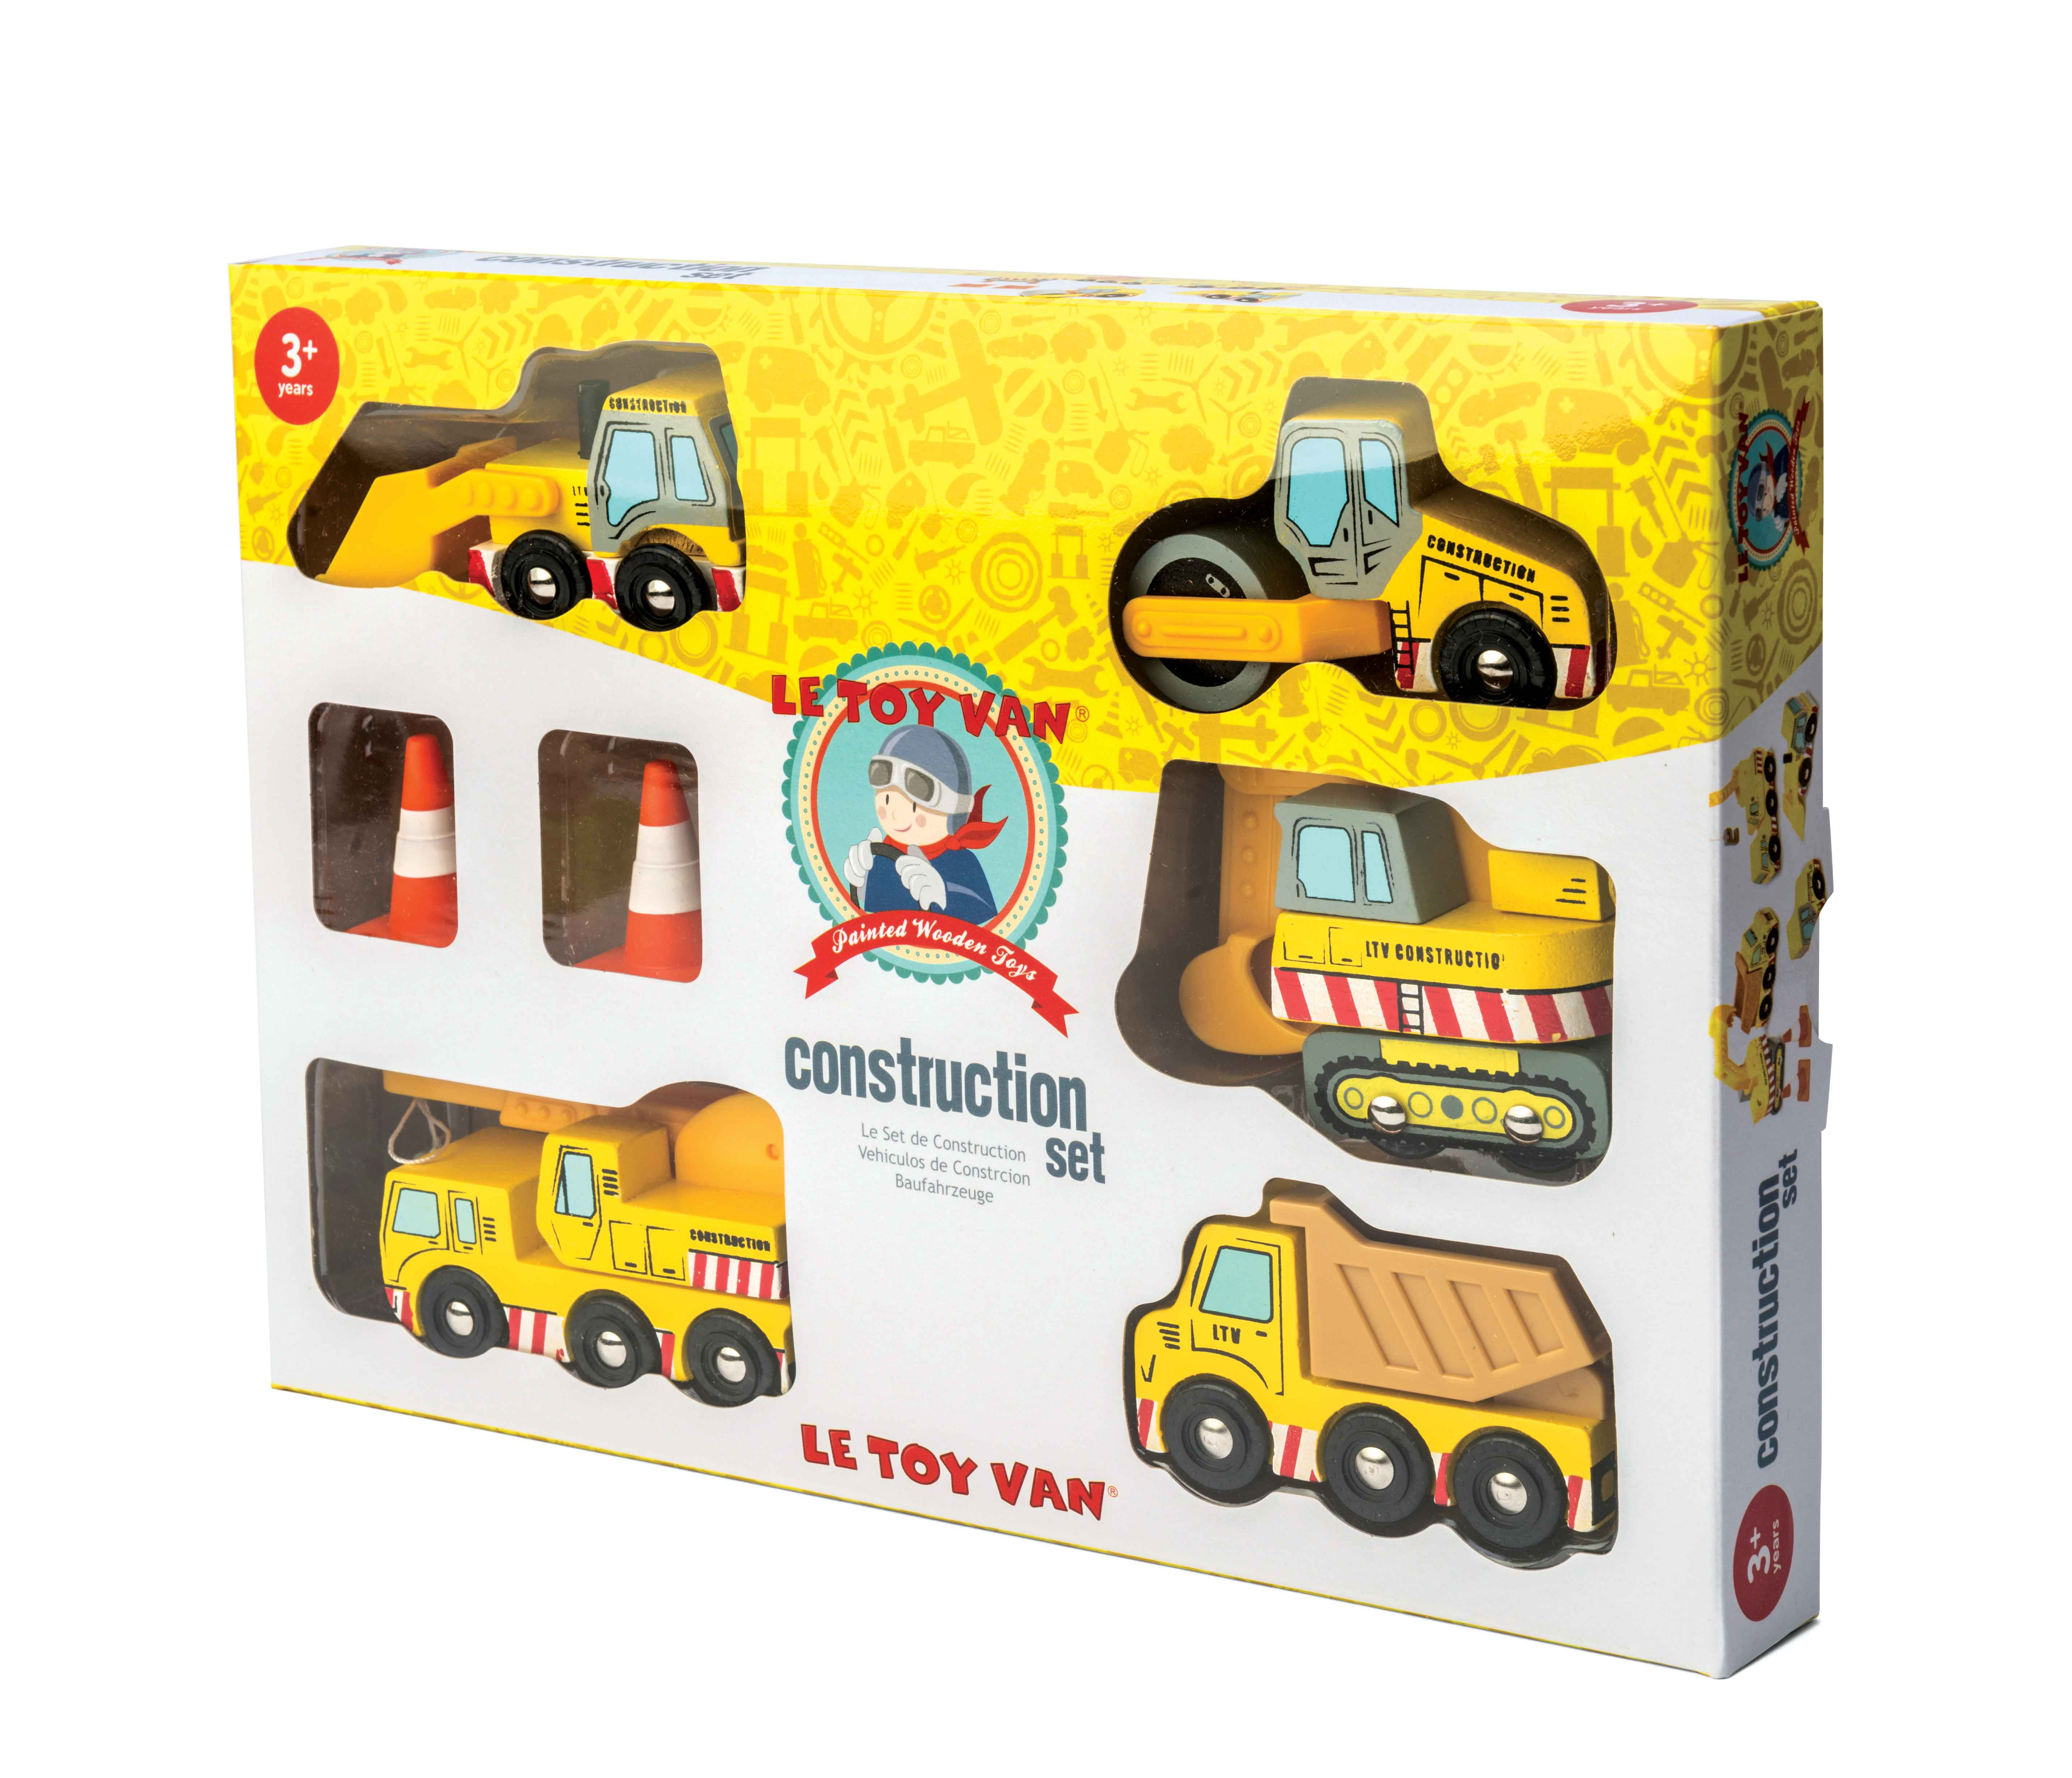 magrudy - le toy van construction set tv442